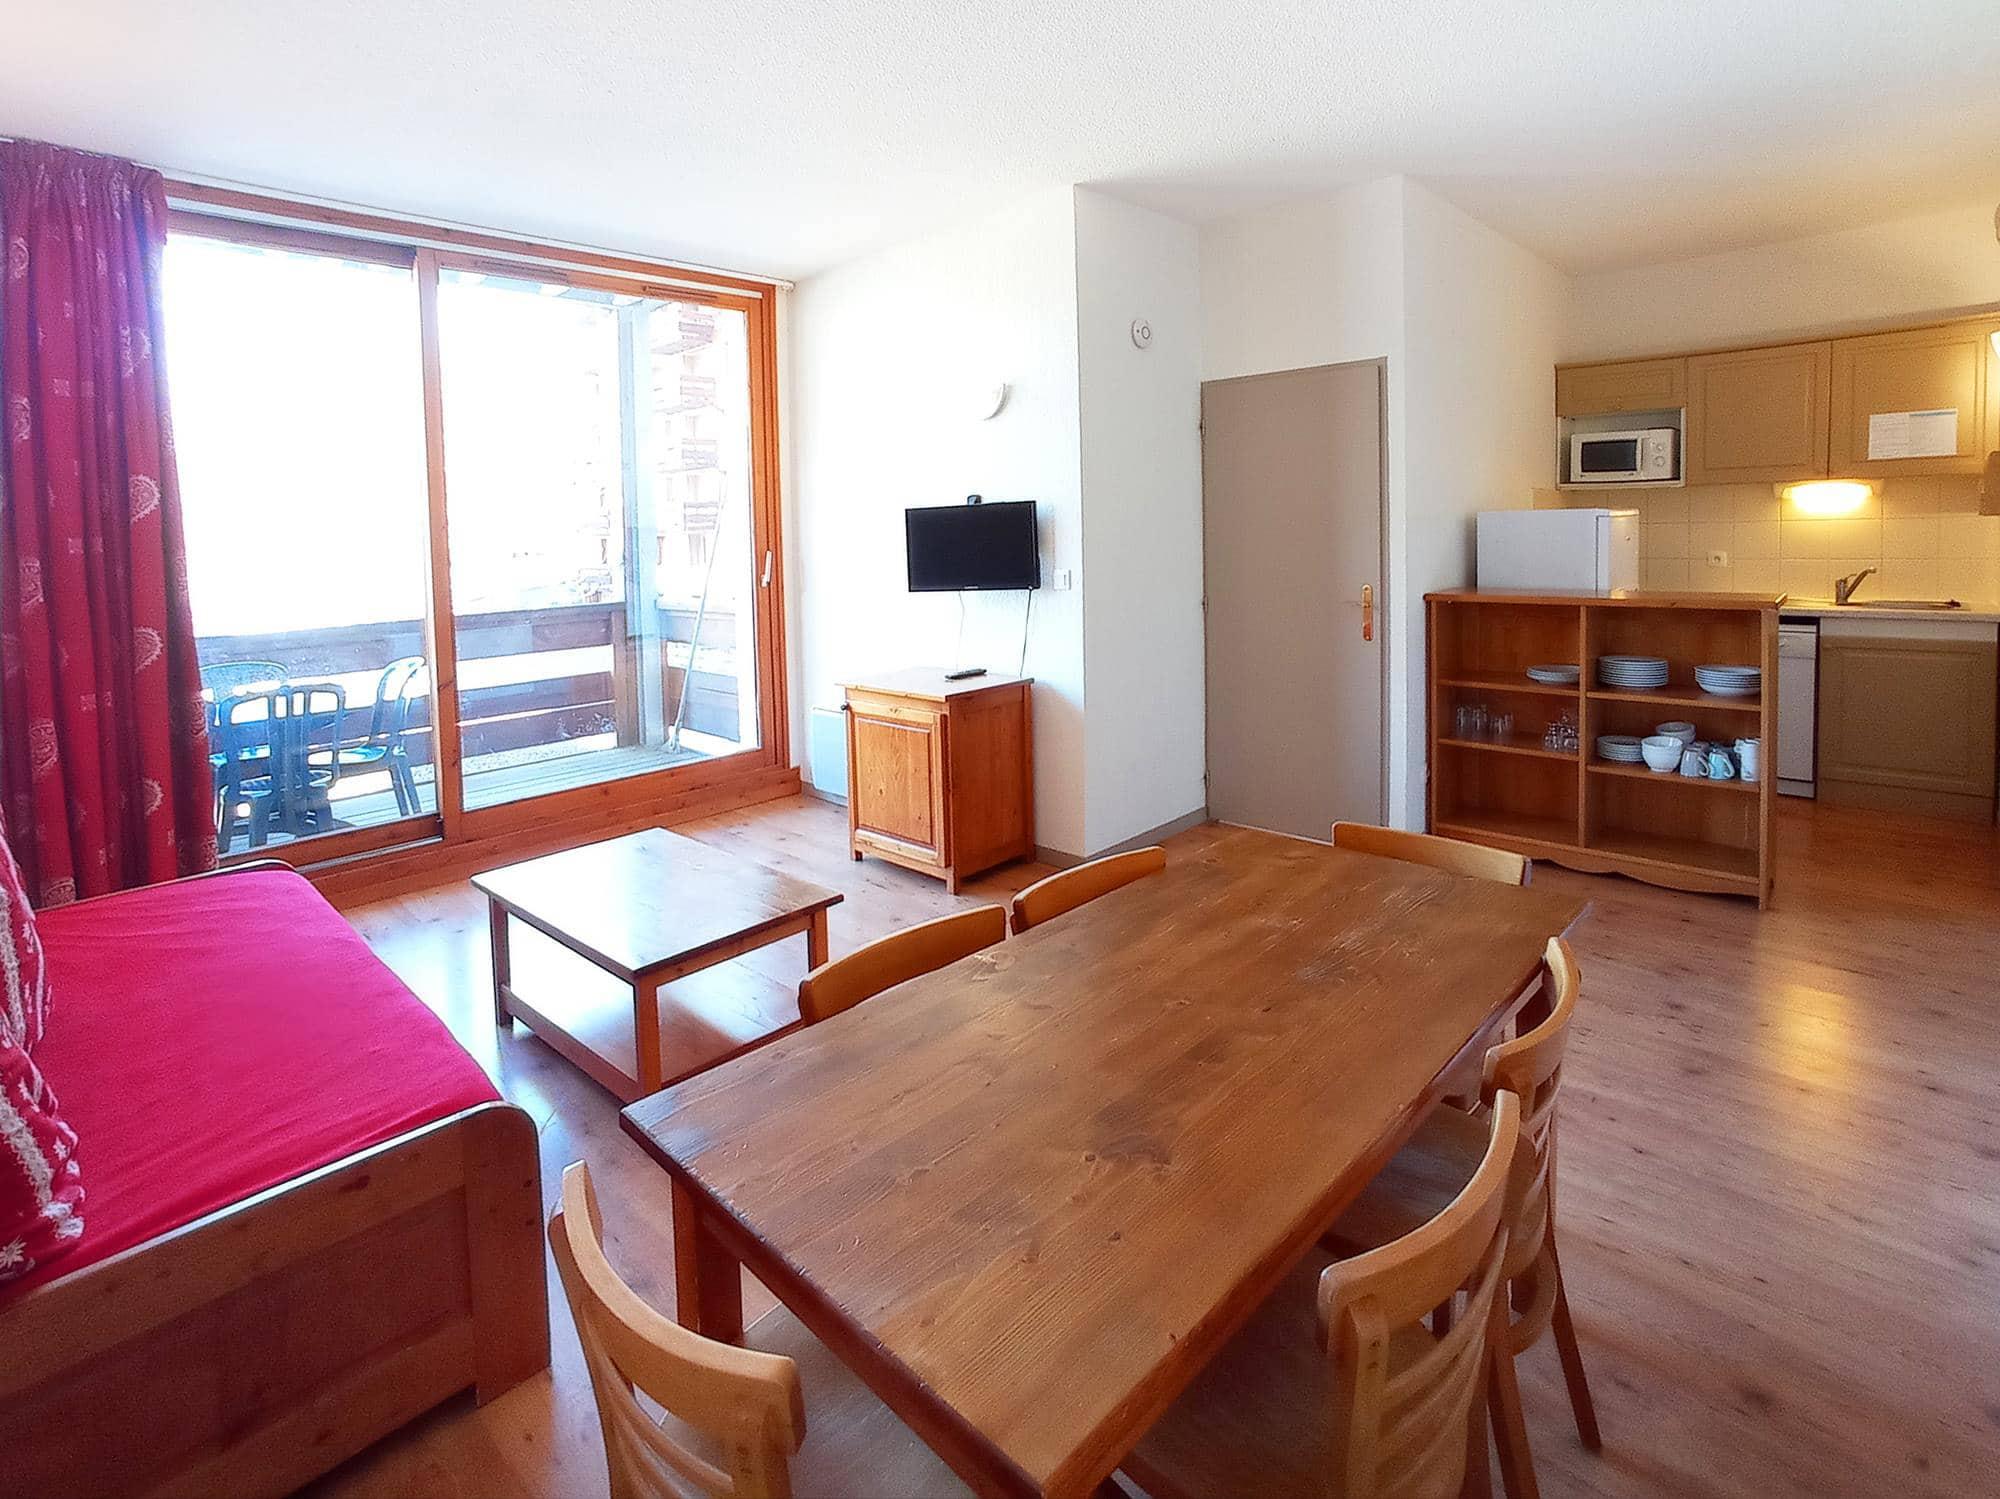 VALLOIRE | 2 BEDROOMS | SWIMMING POOL 1